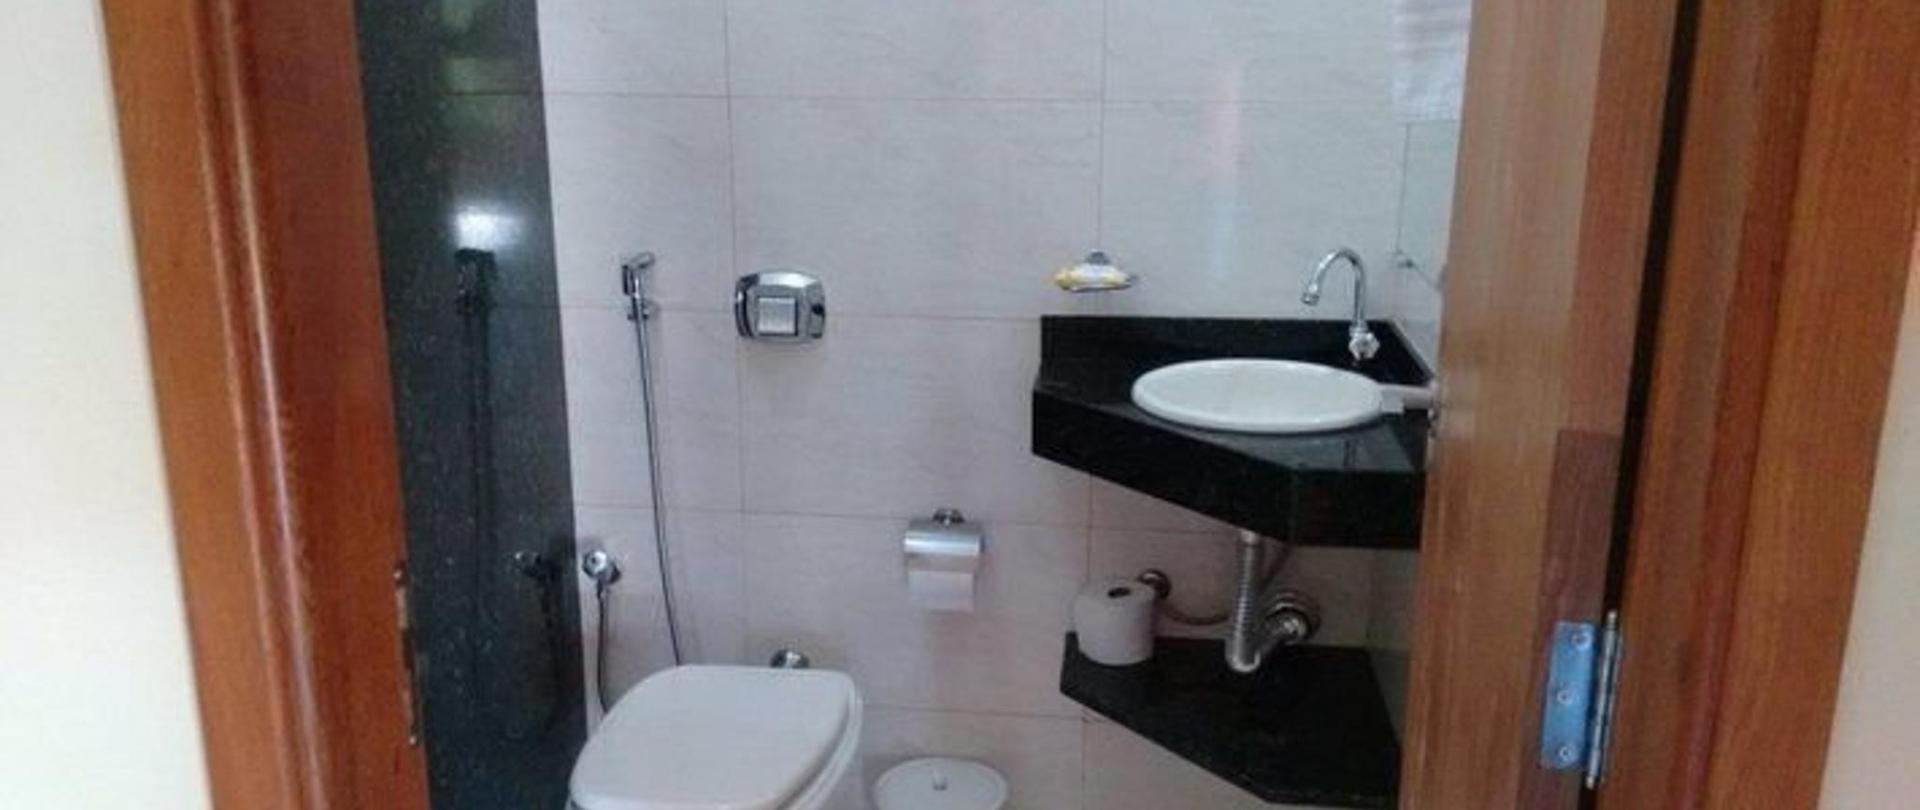 03-banheiro-2-1.jpg